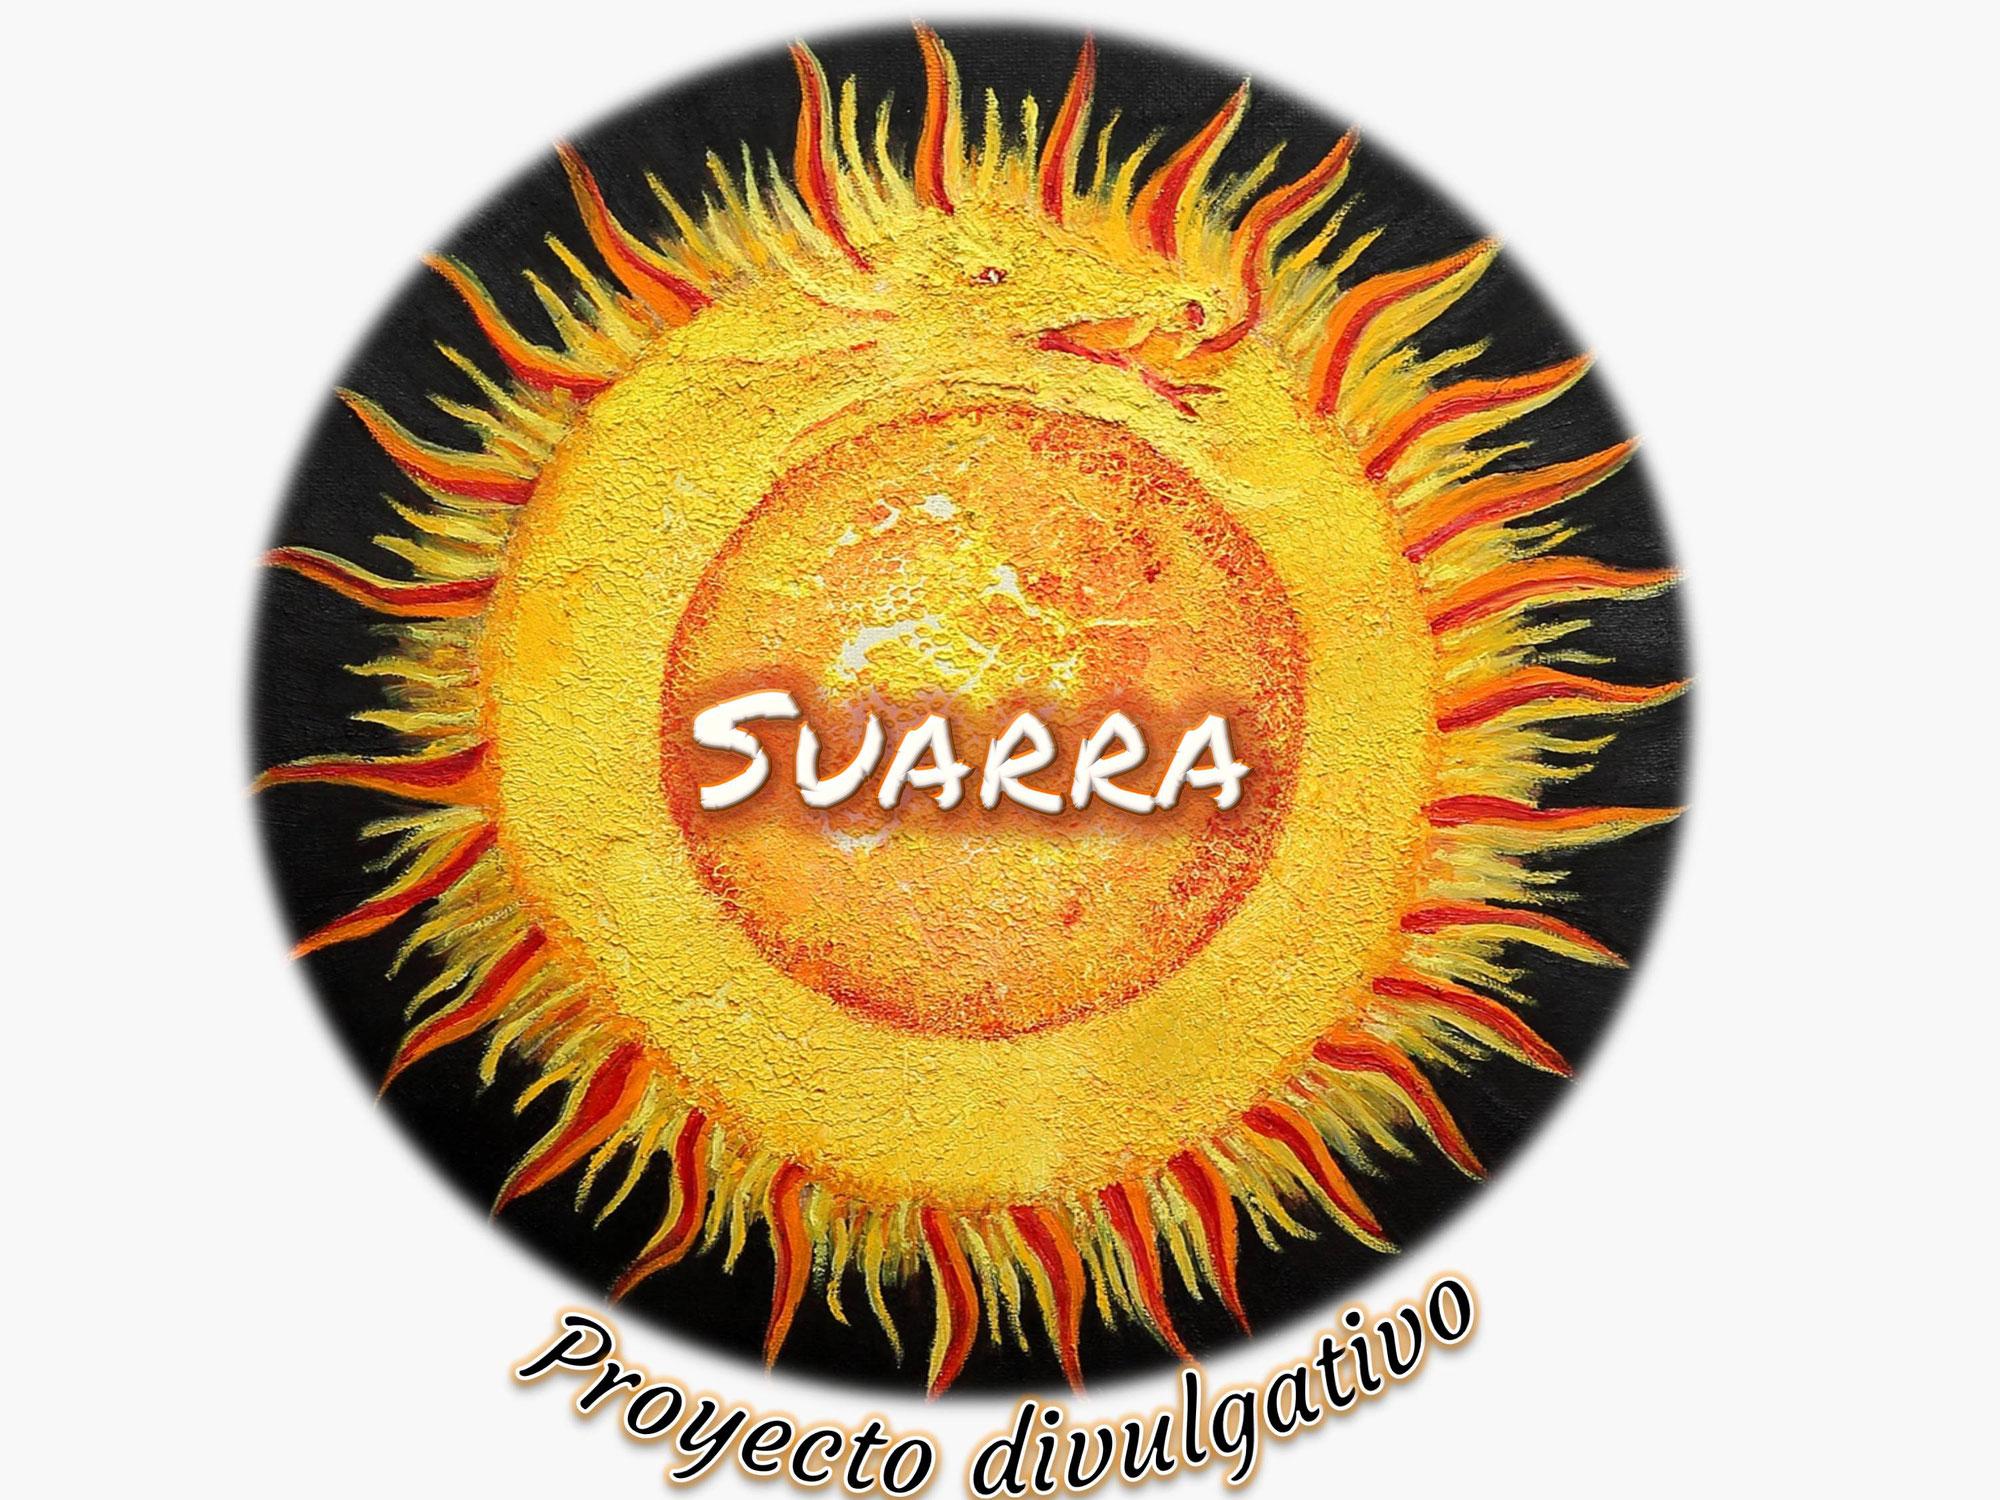 PROYECTO DIVULGATIVO SUARRA